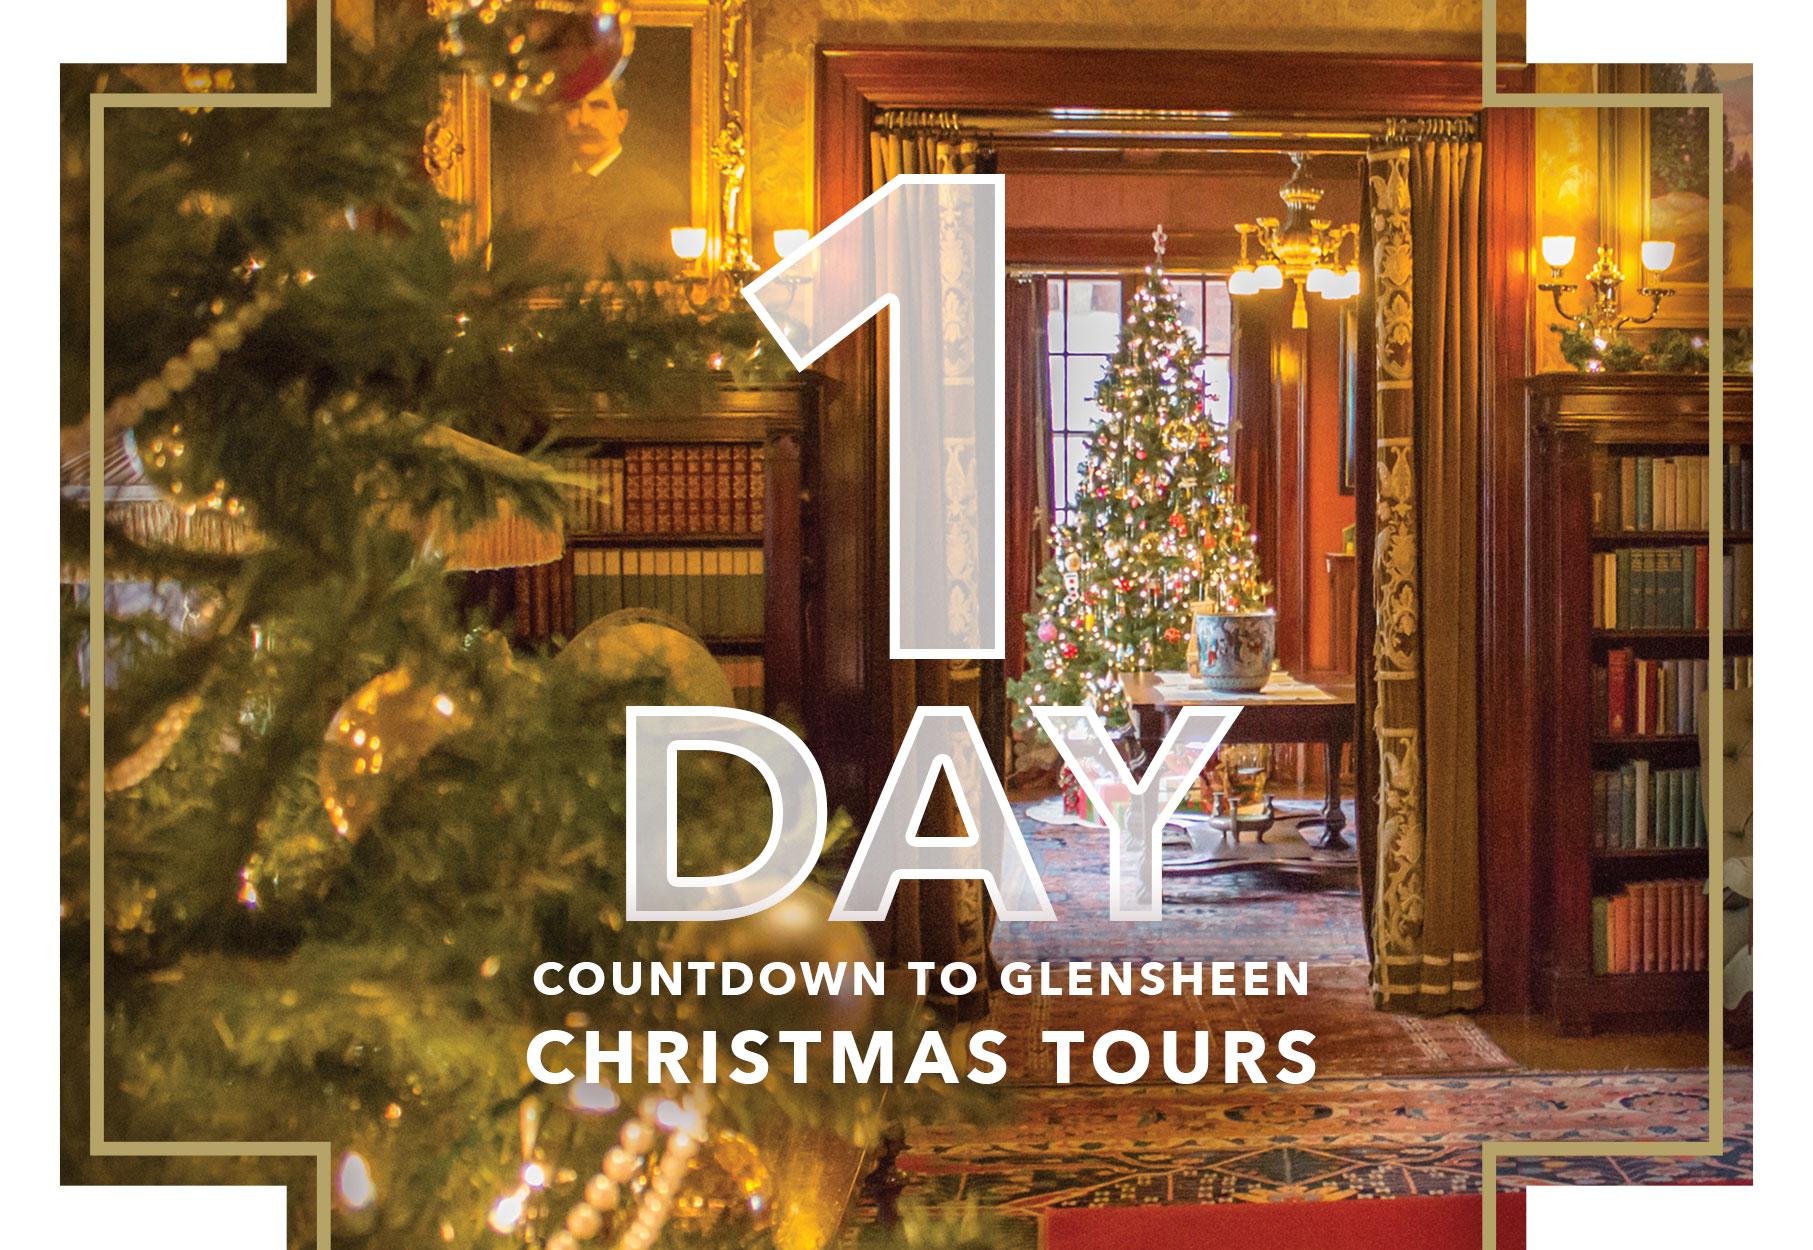 Christmas Tours.1 Day Until Christmas Tours Glensheen